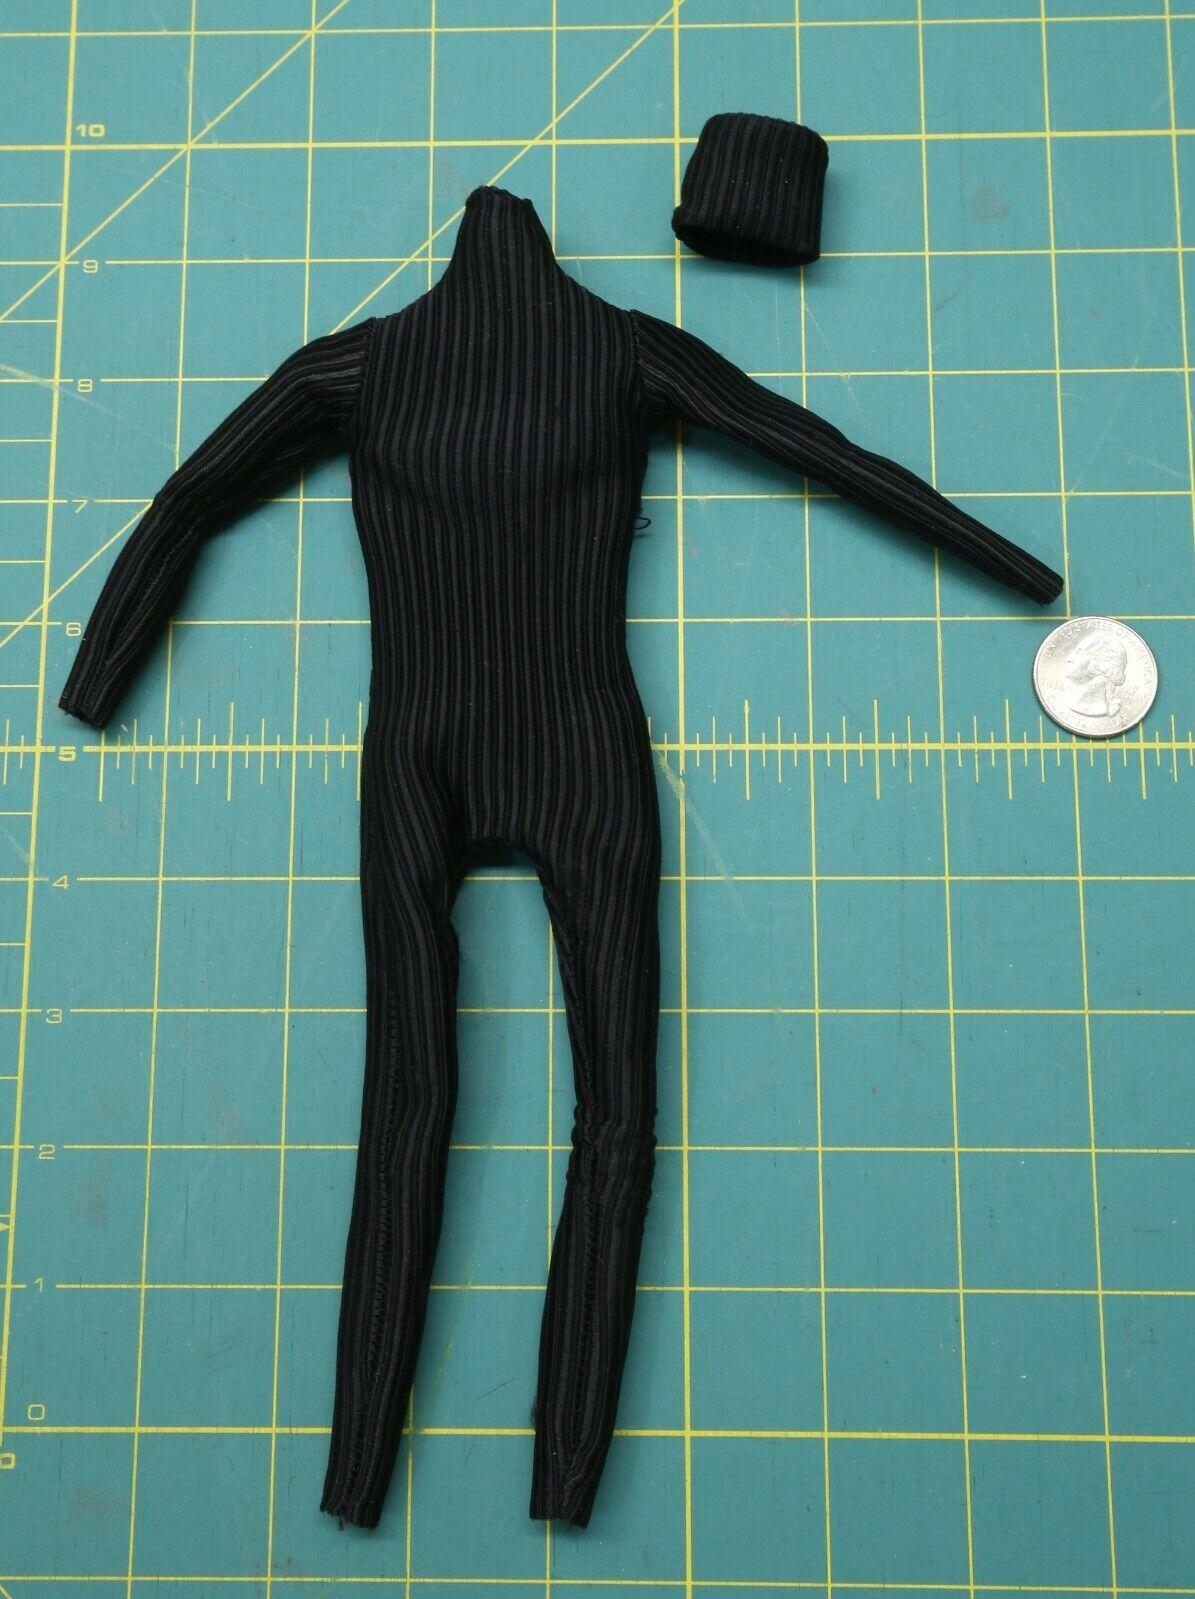 Sideshow 1/6 Scale Commander Cody Bodysuit on eBay thumbnail